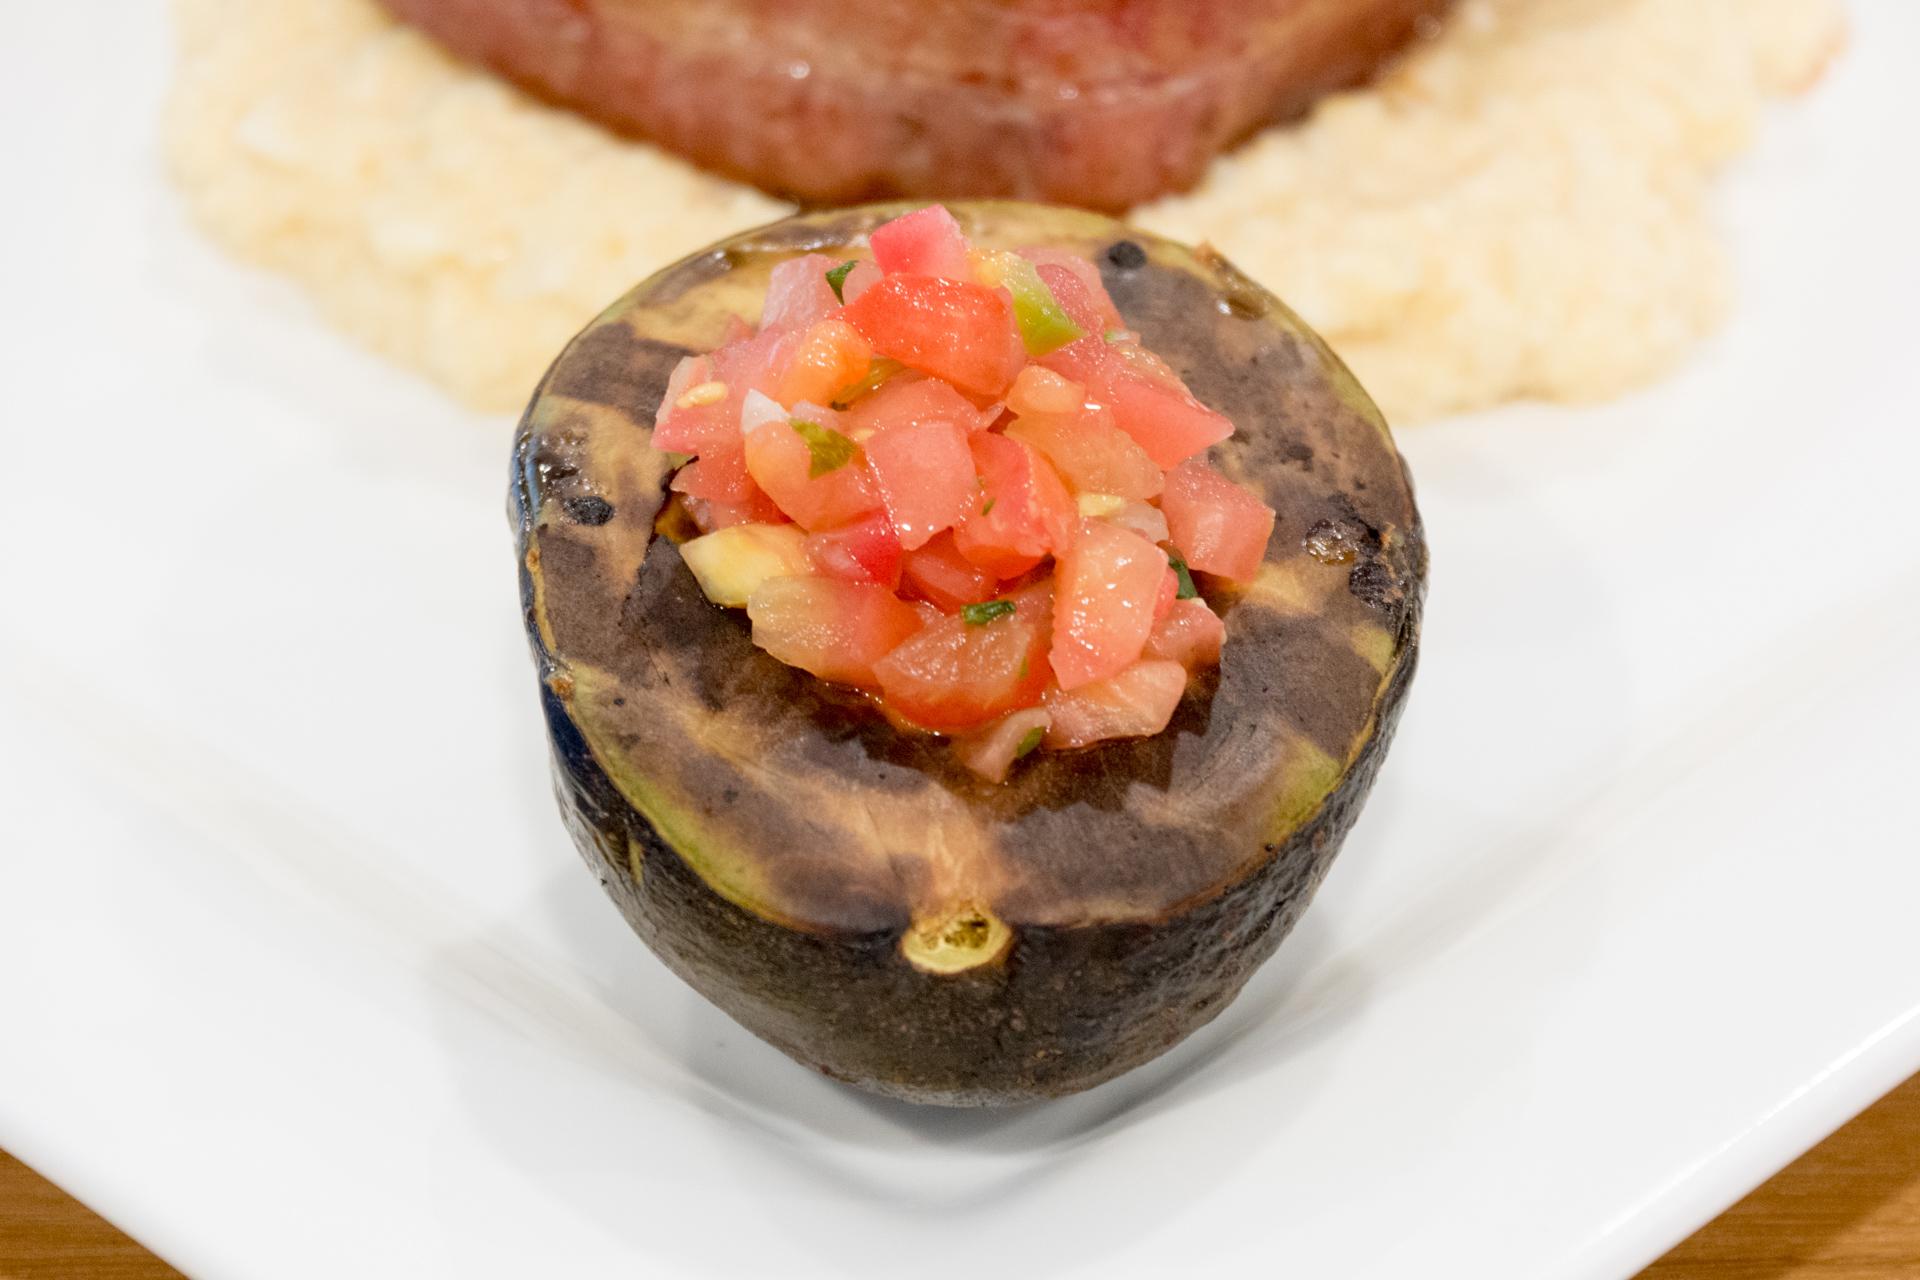 Grilled Avocado - Caveman Keto